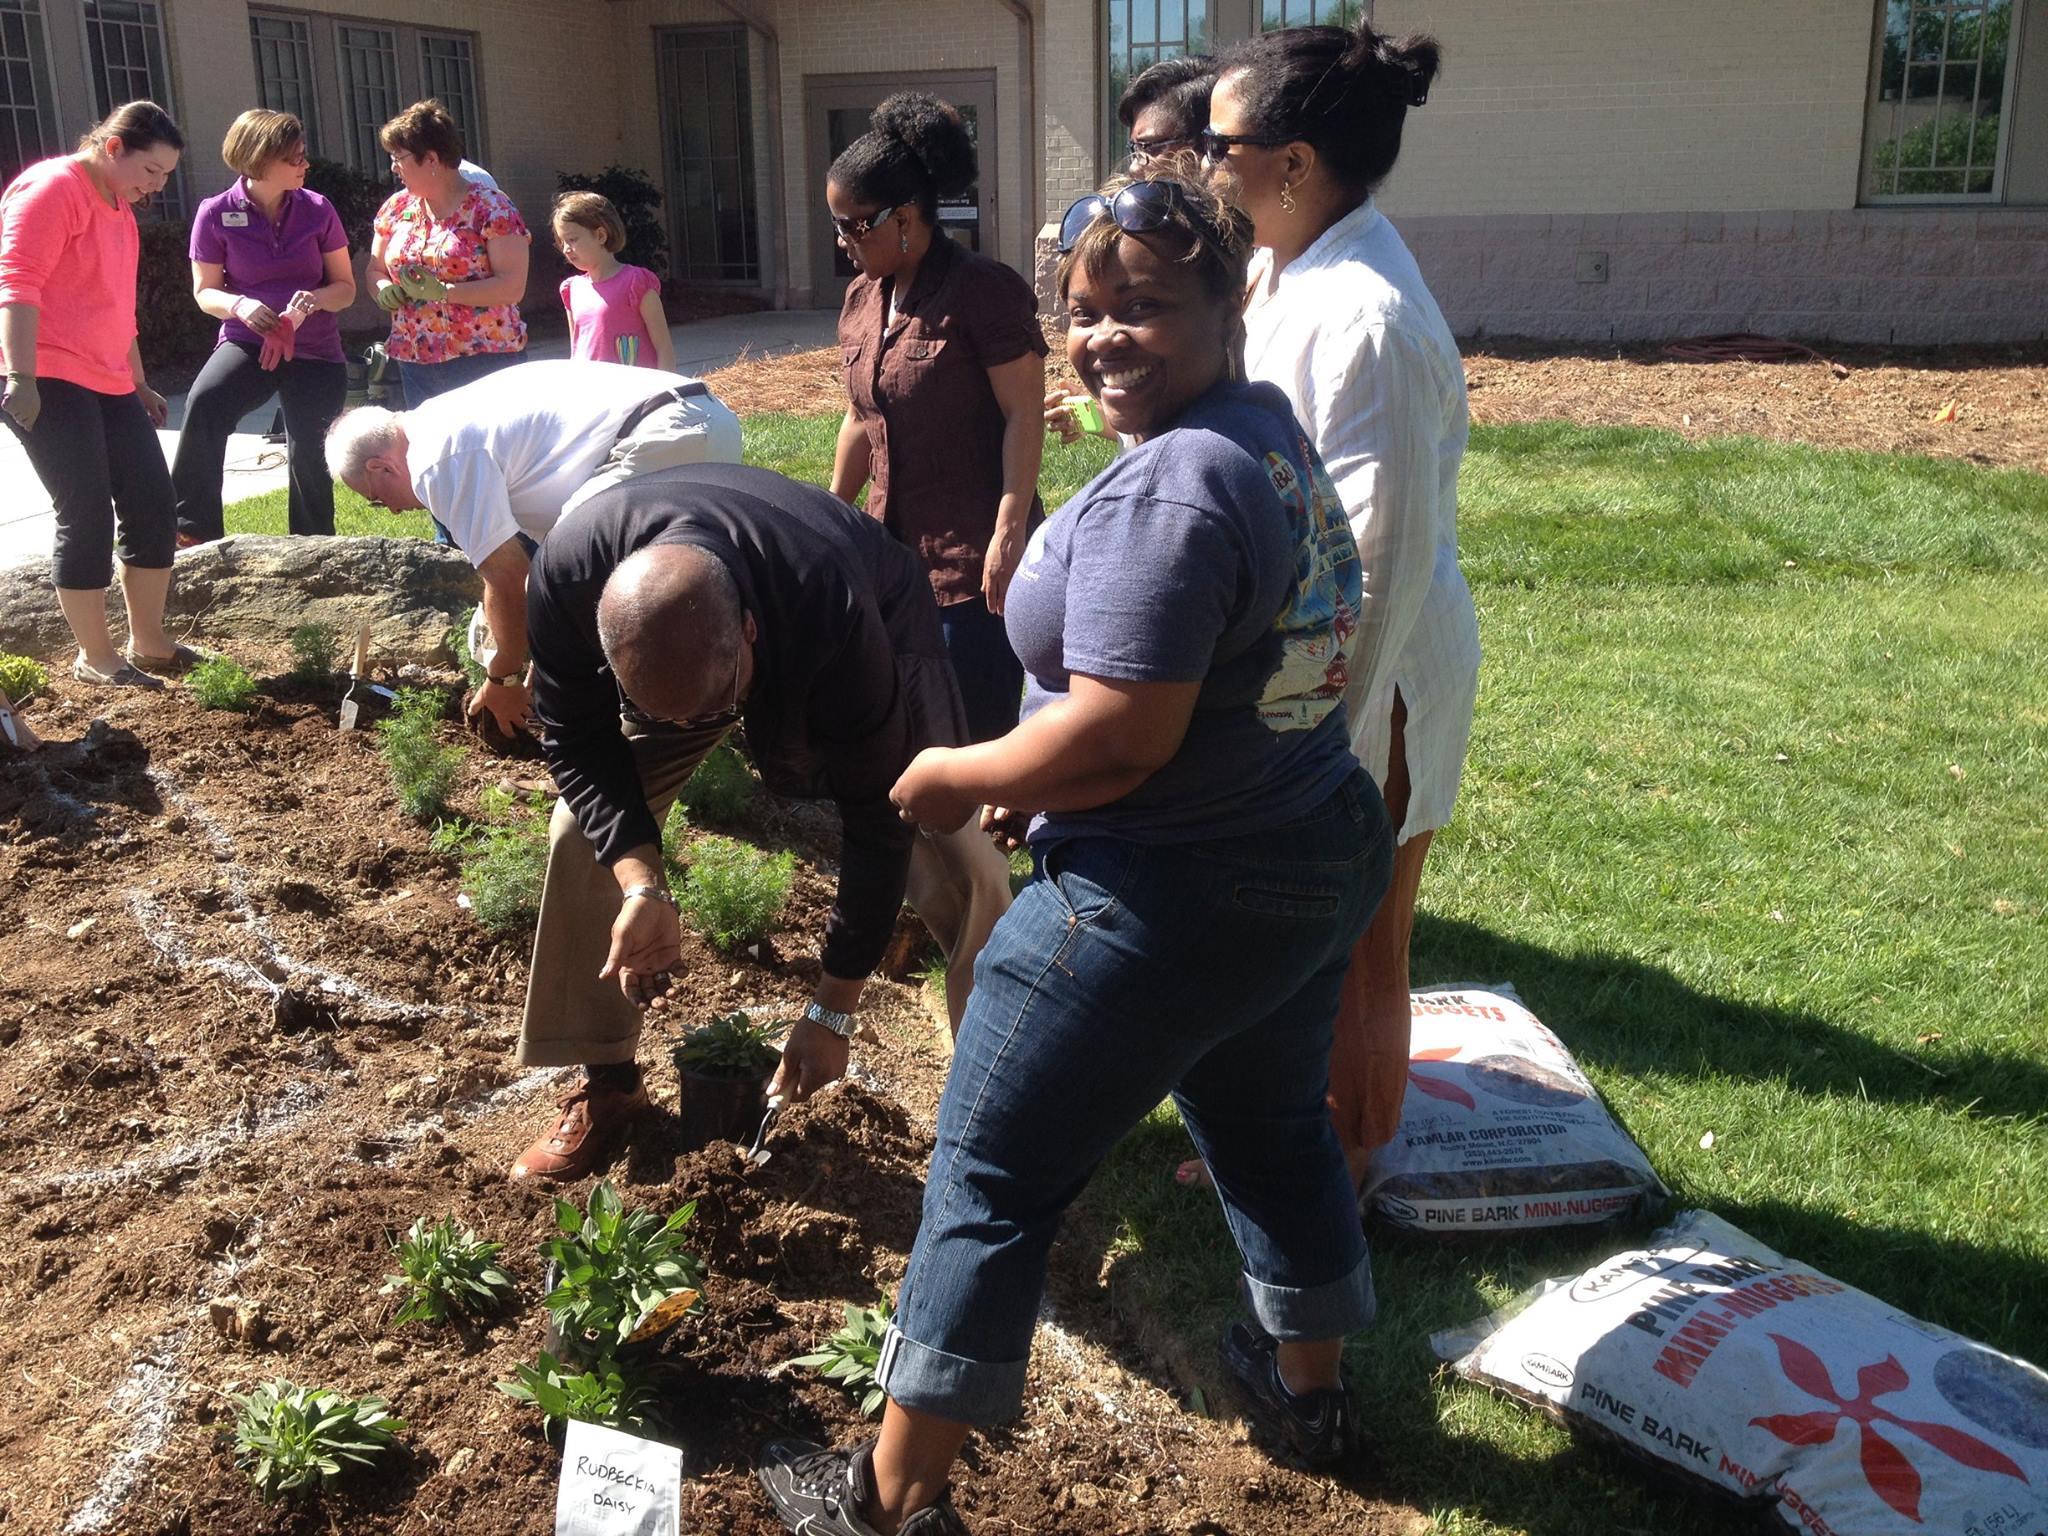 Staff & supporters plant perennials in the Memorial Garden.